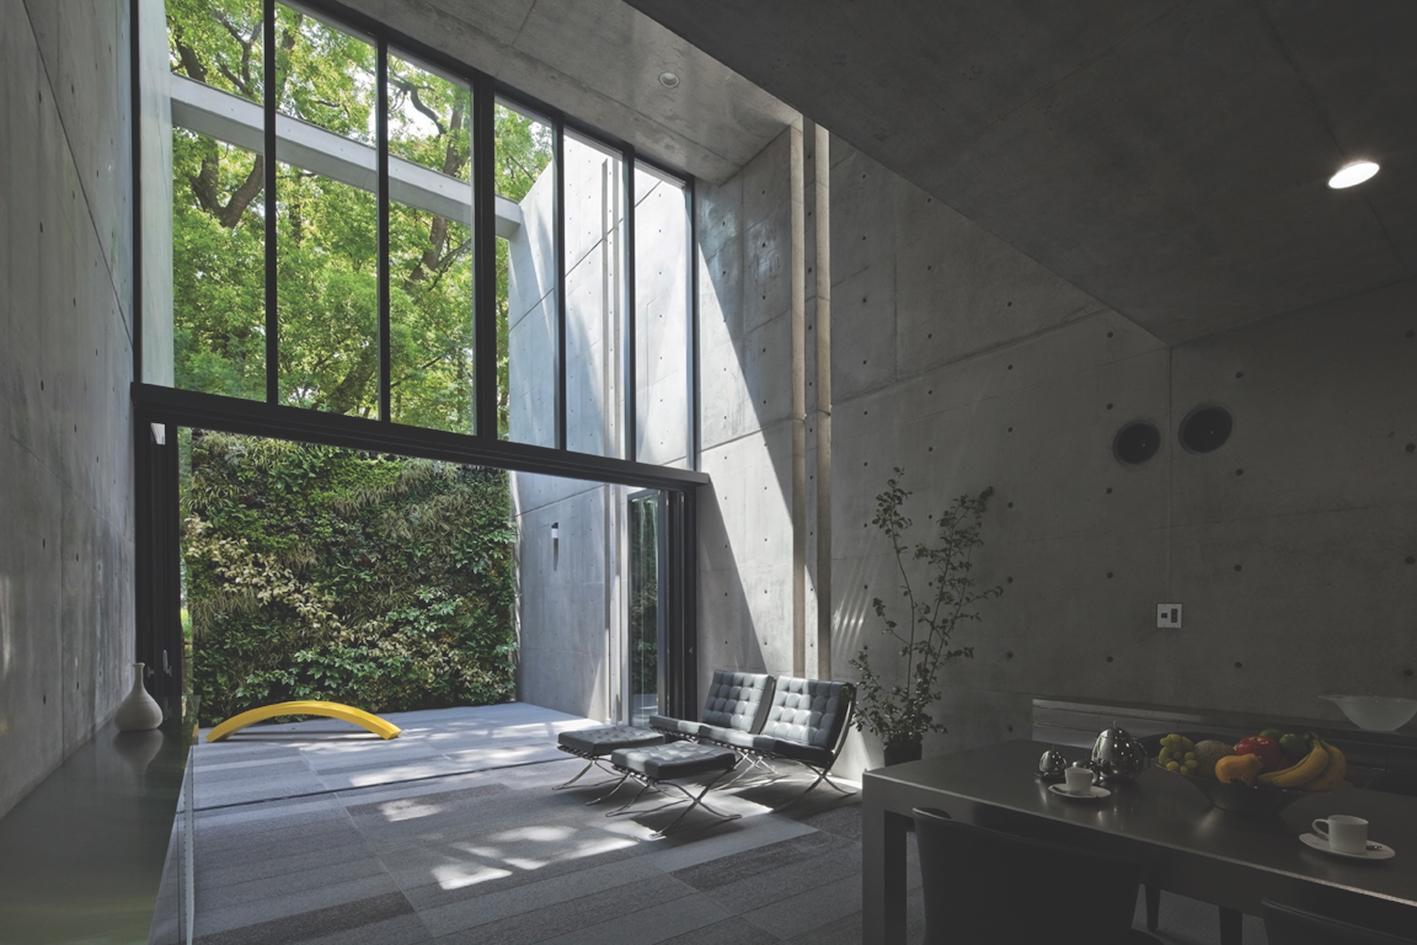 House in utsubo park tadao ando architect assoc japanese interior design books - Home interior design books ...